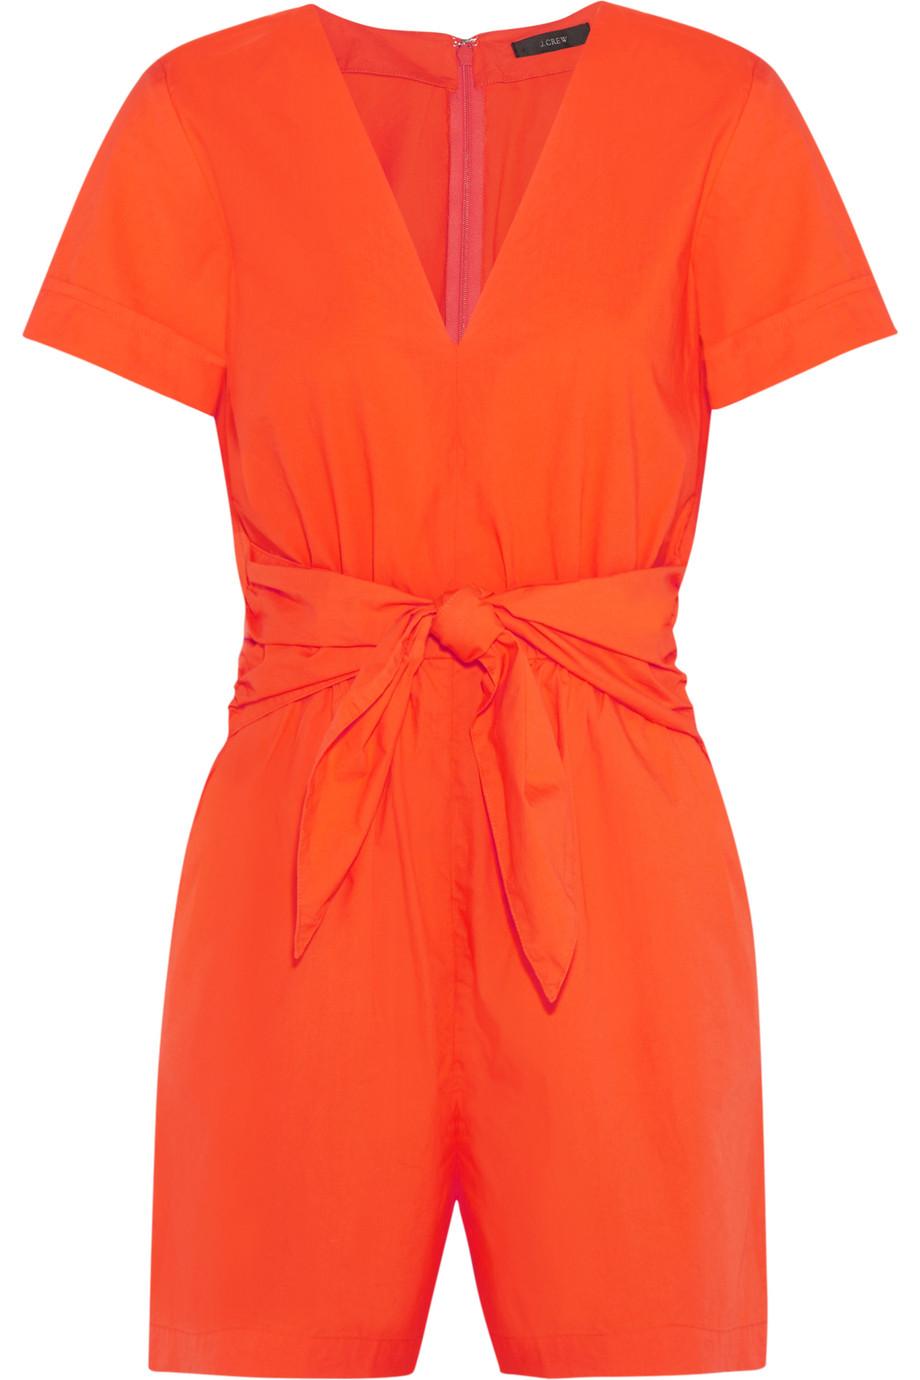 J.Crew Tessa Tie-Front Cotton-Poplin Playsuit, Bright Orange, Women's, Size: 12